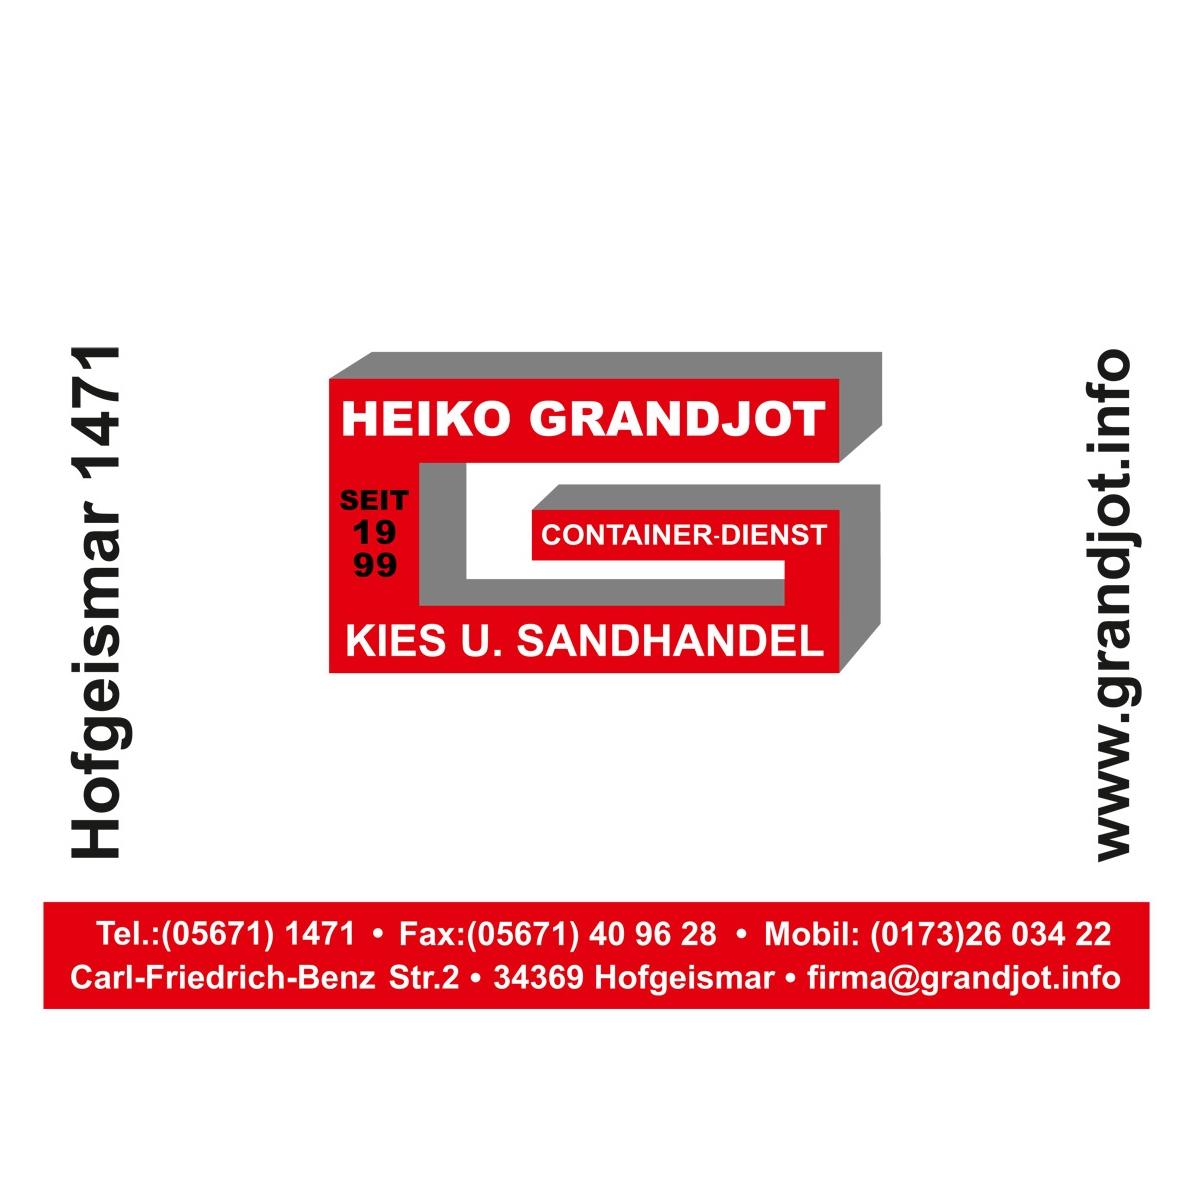 Grandjot-logo-1.jpg